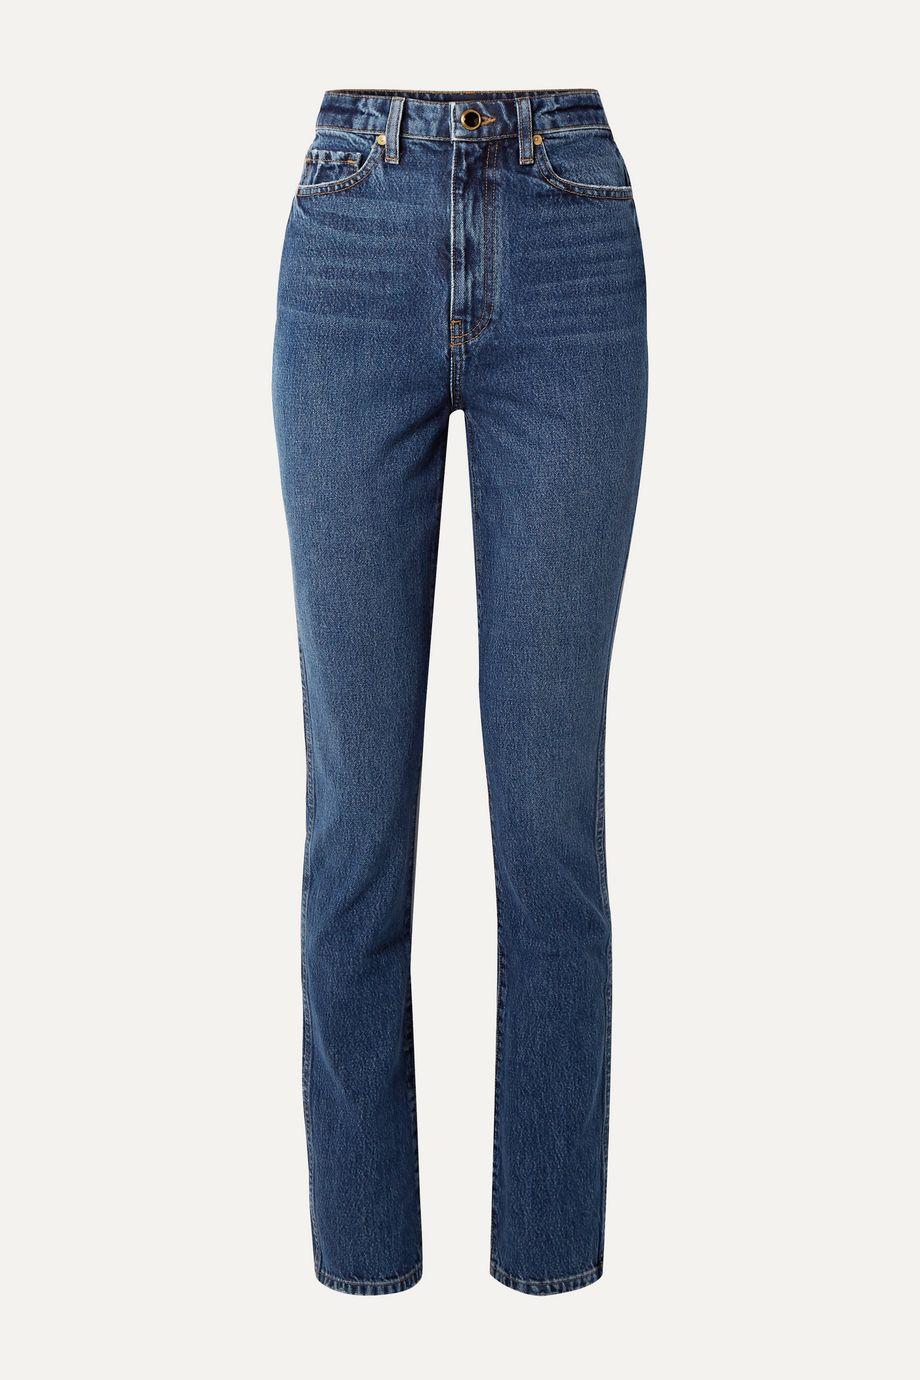 Khaite Daria high-rise slim-leg jeans